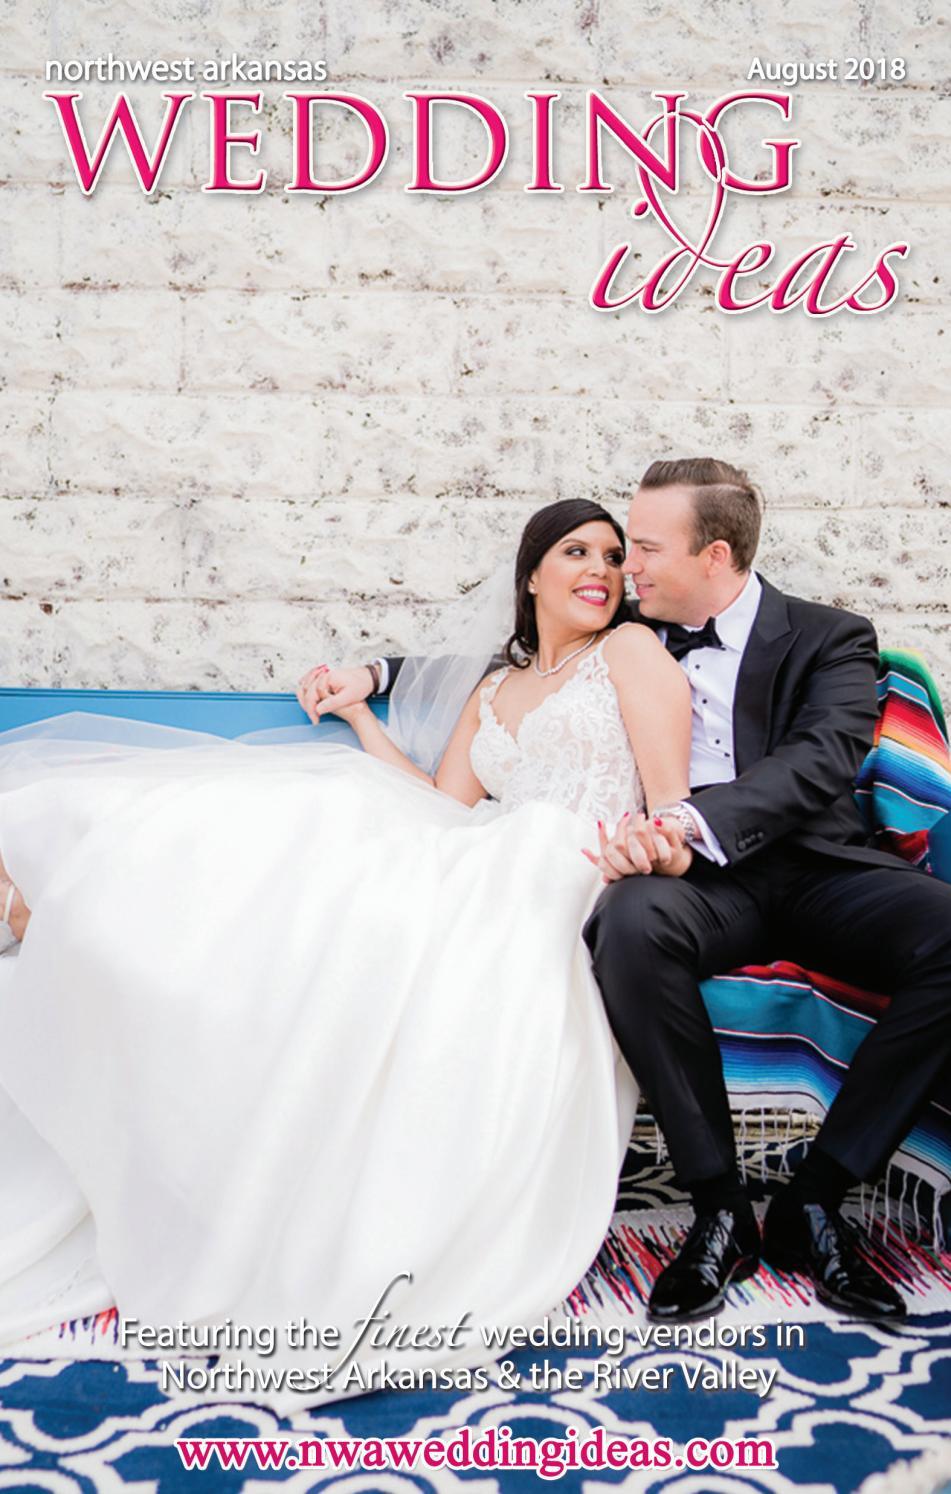 NW Arkansas Wedding Ideas - August 2018